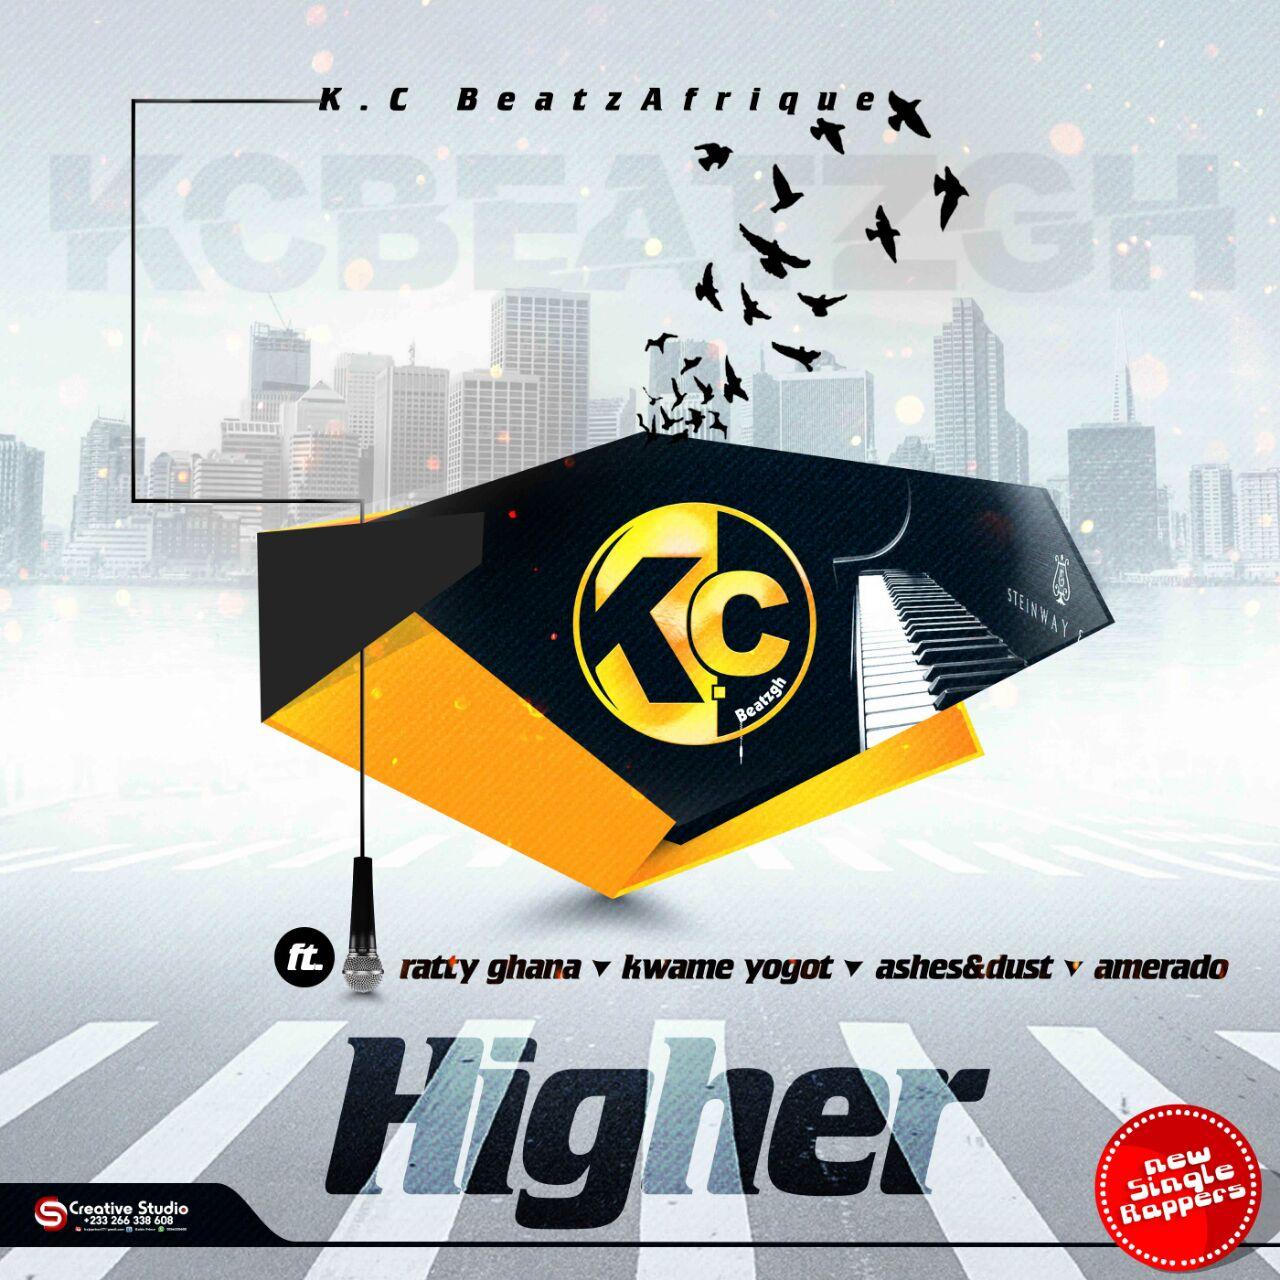 K.C Beatz Afrique ft Ratty ghana,Amerado,Kwame Yogot,Ashes & Dust